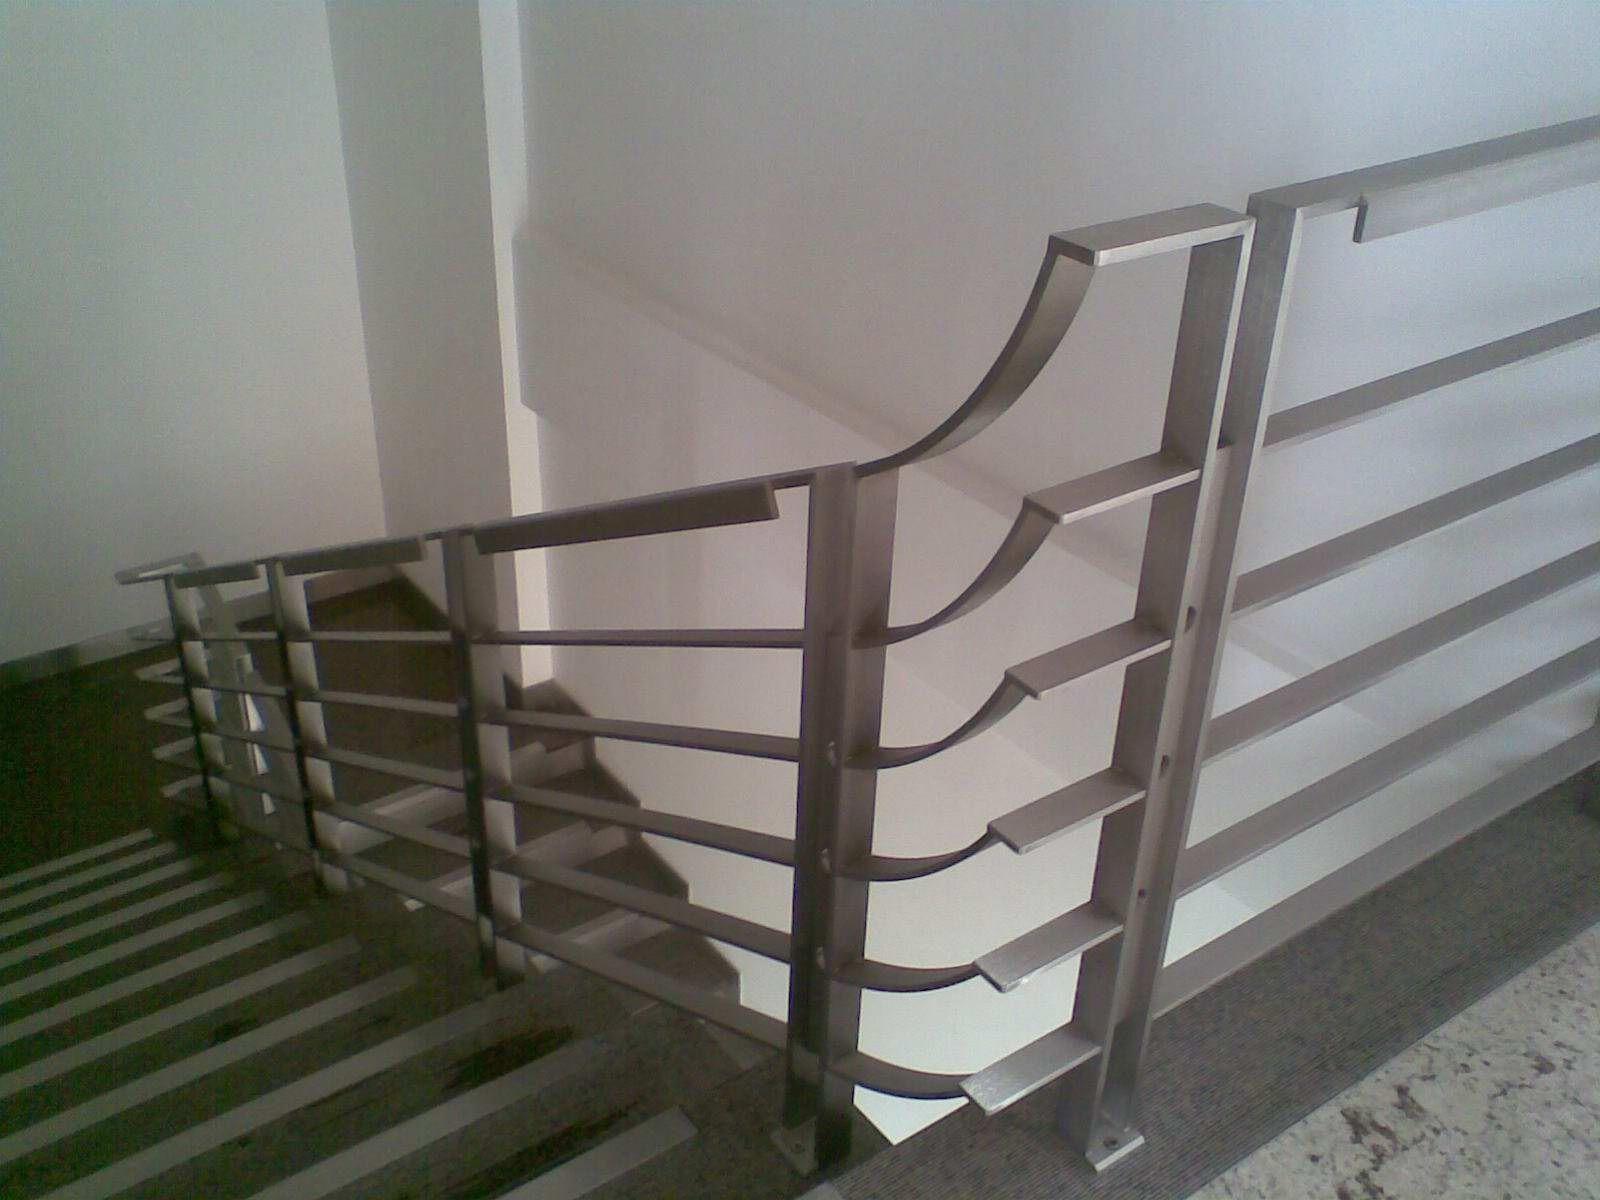 Stainless Steel Stair Railing Designs